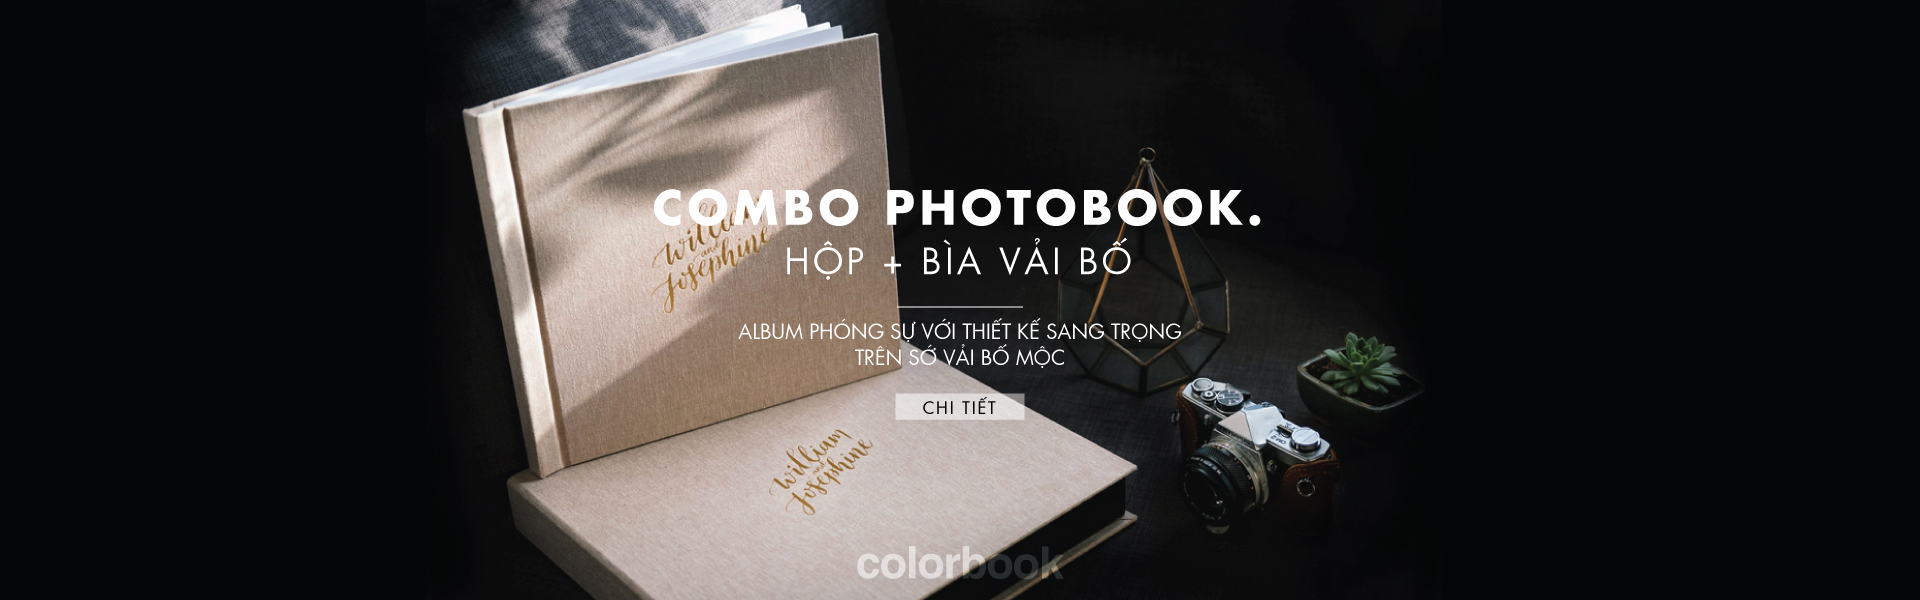 photobook cao cap bia vai bo